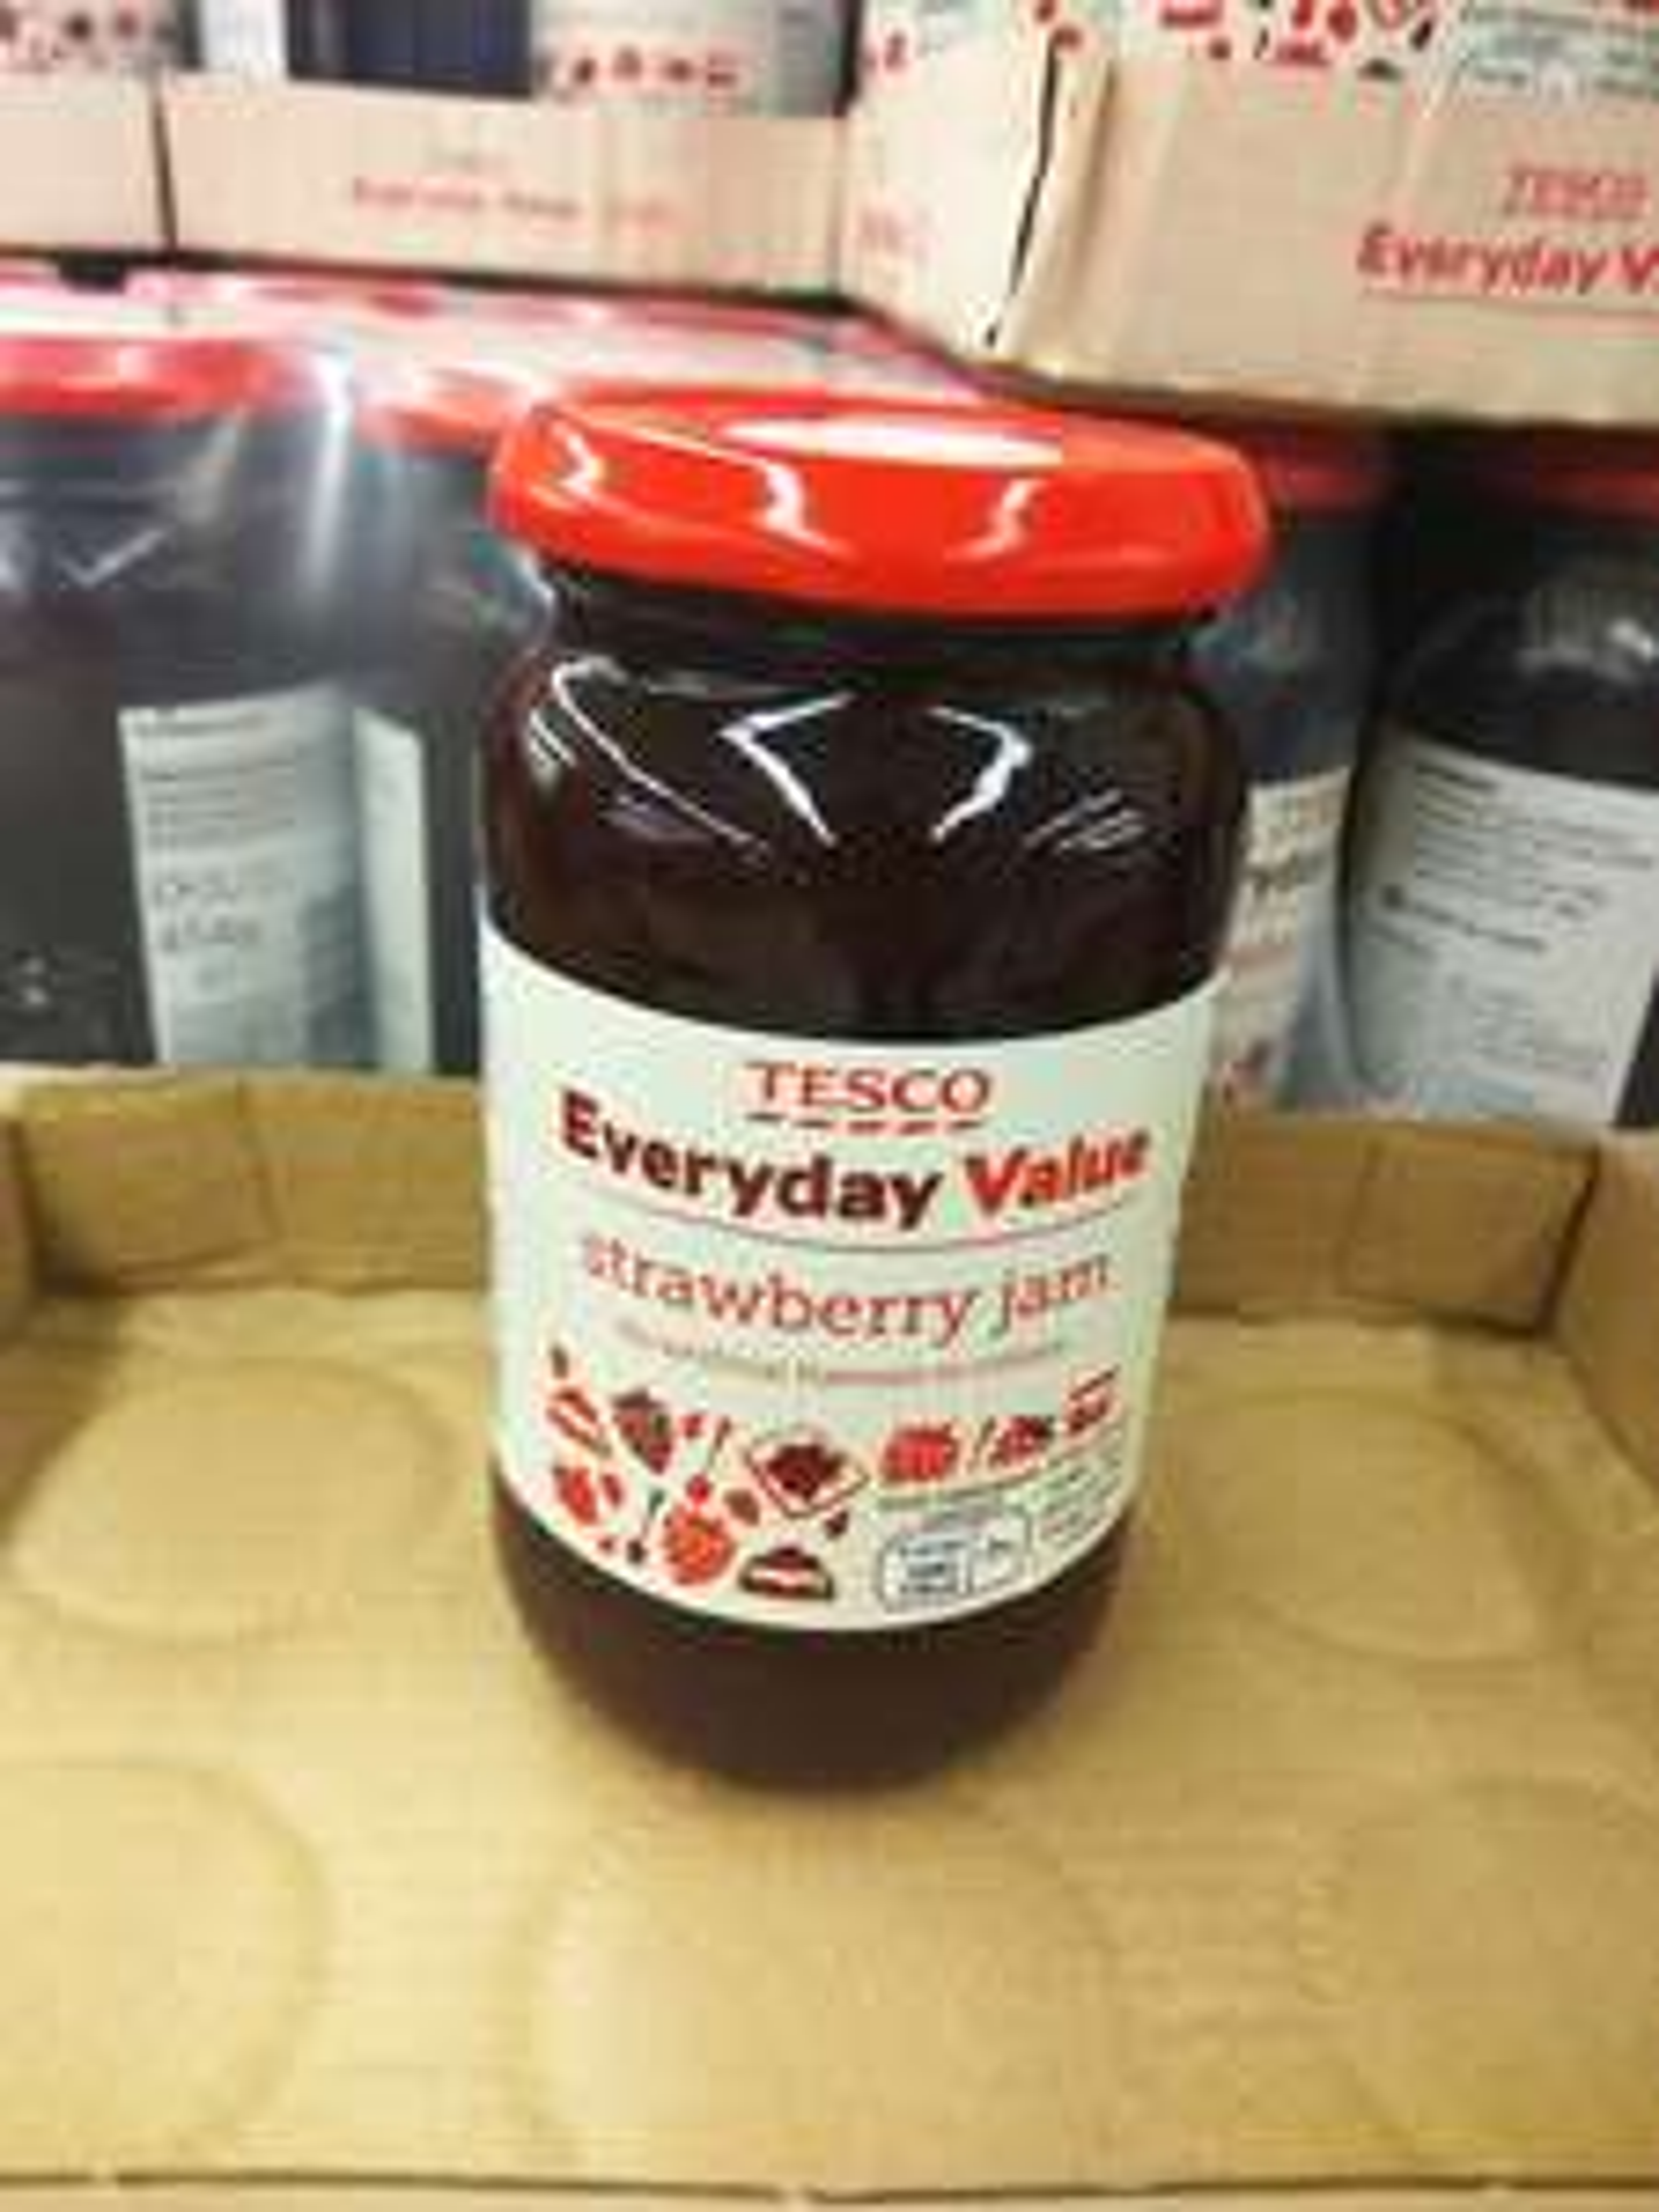 Tesco Everyday Value Strawberry Jam 454g 10p in-store @ Tesco Sale